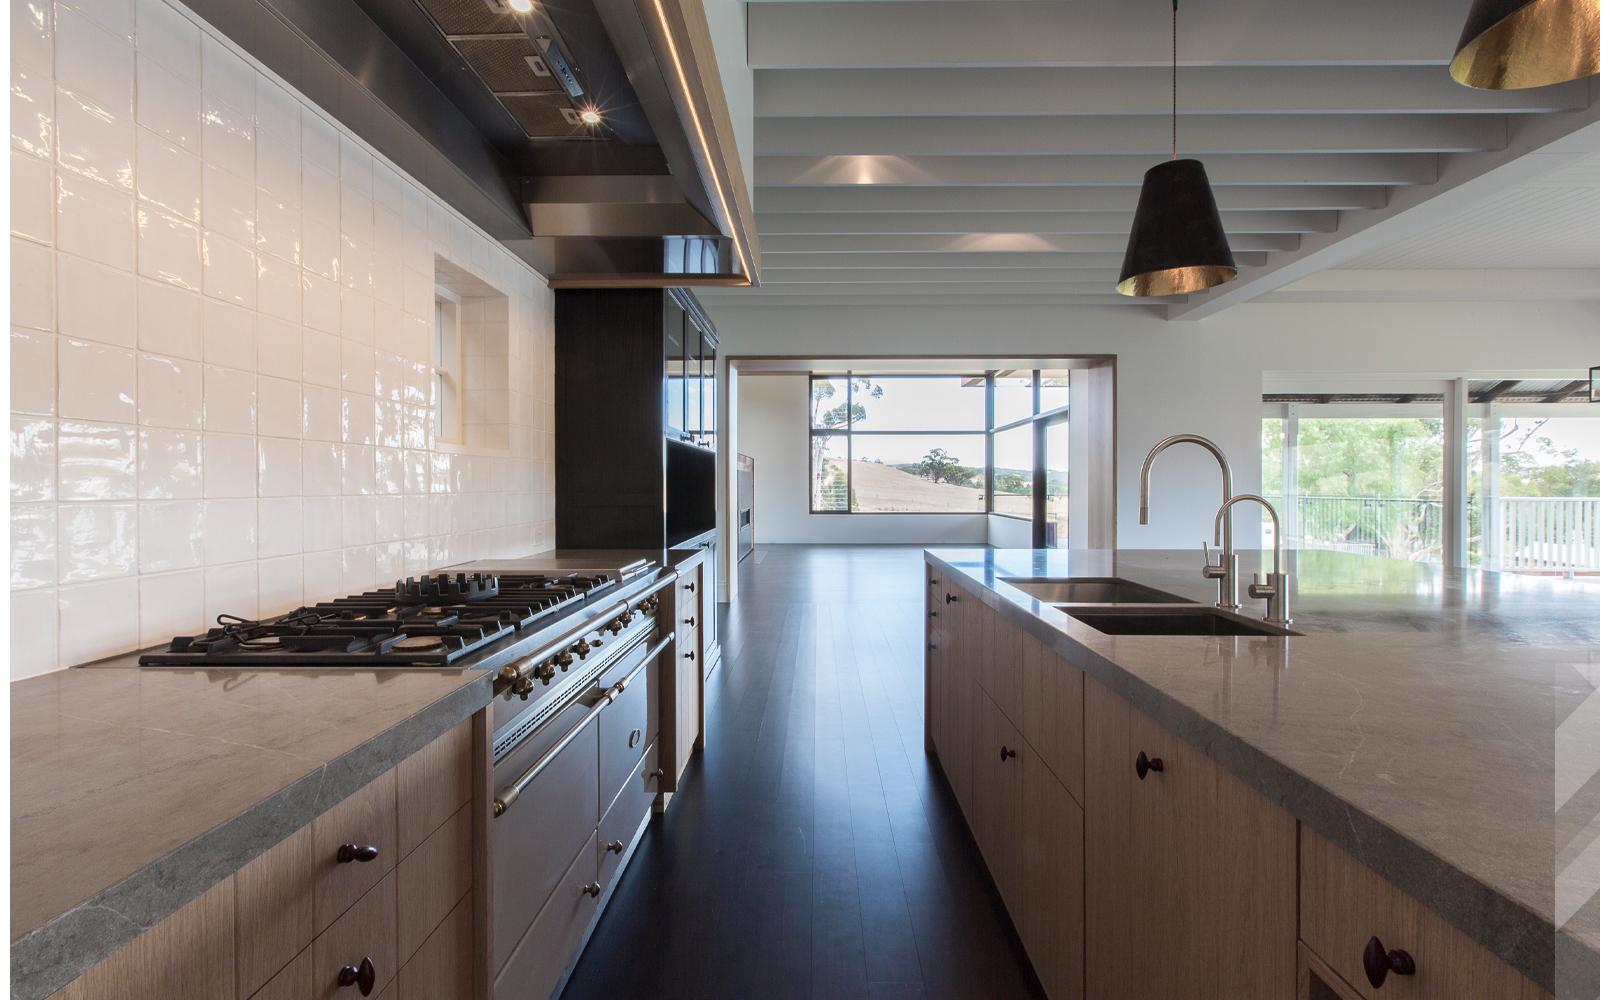 maek-luxury-home-design-inspiration-toodyay-kitchen-gallery-7.jpg